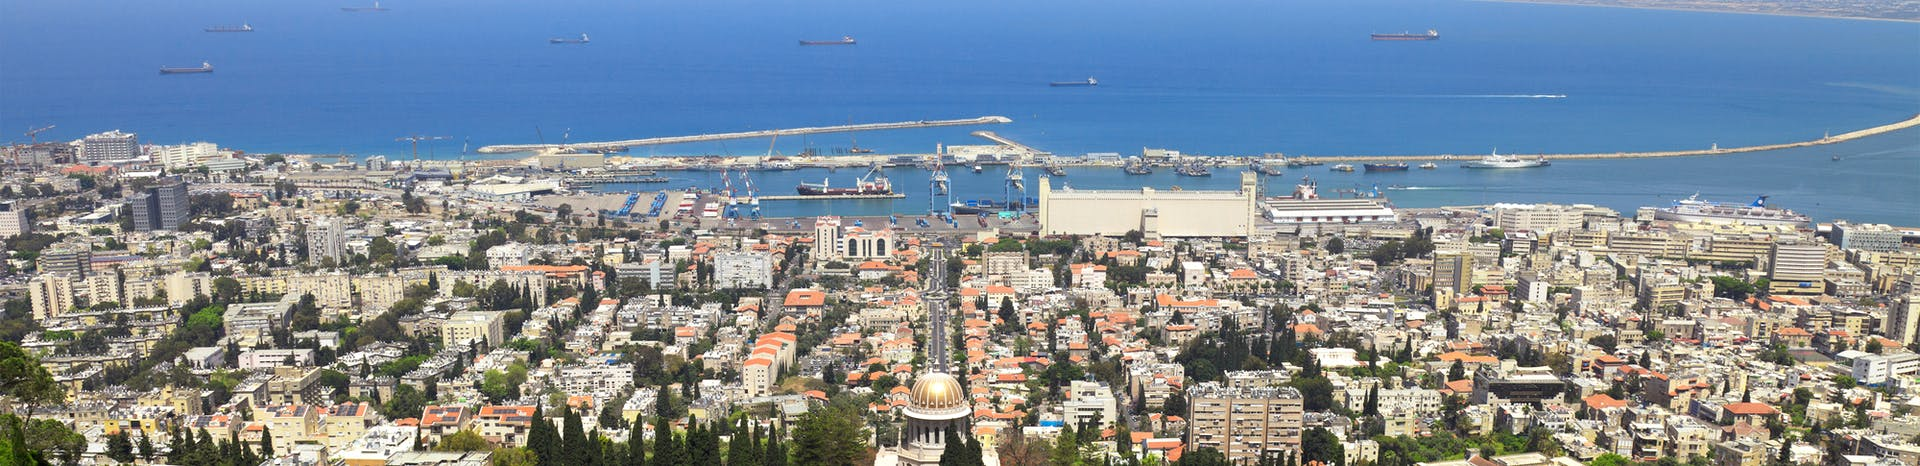 Picture of Haifa